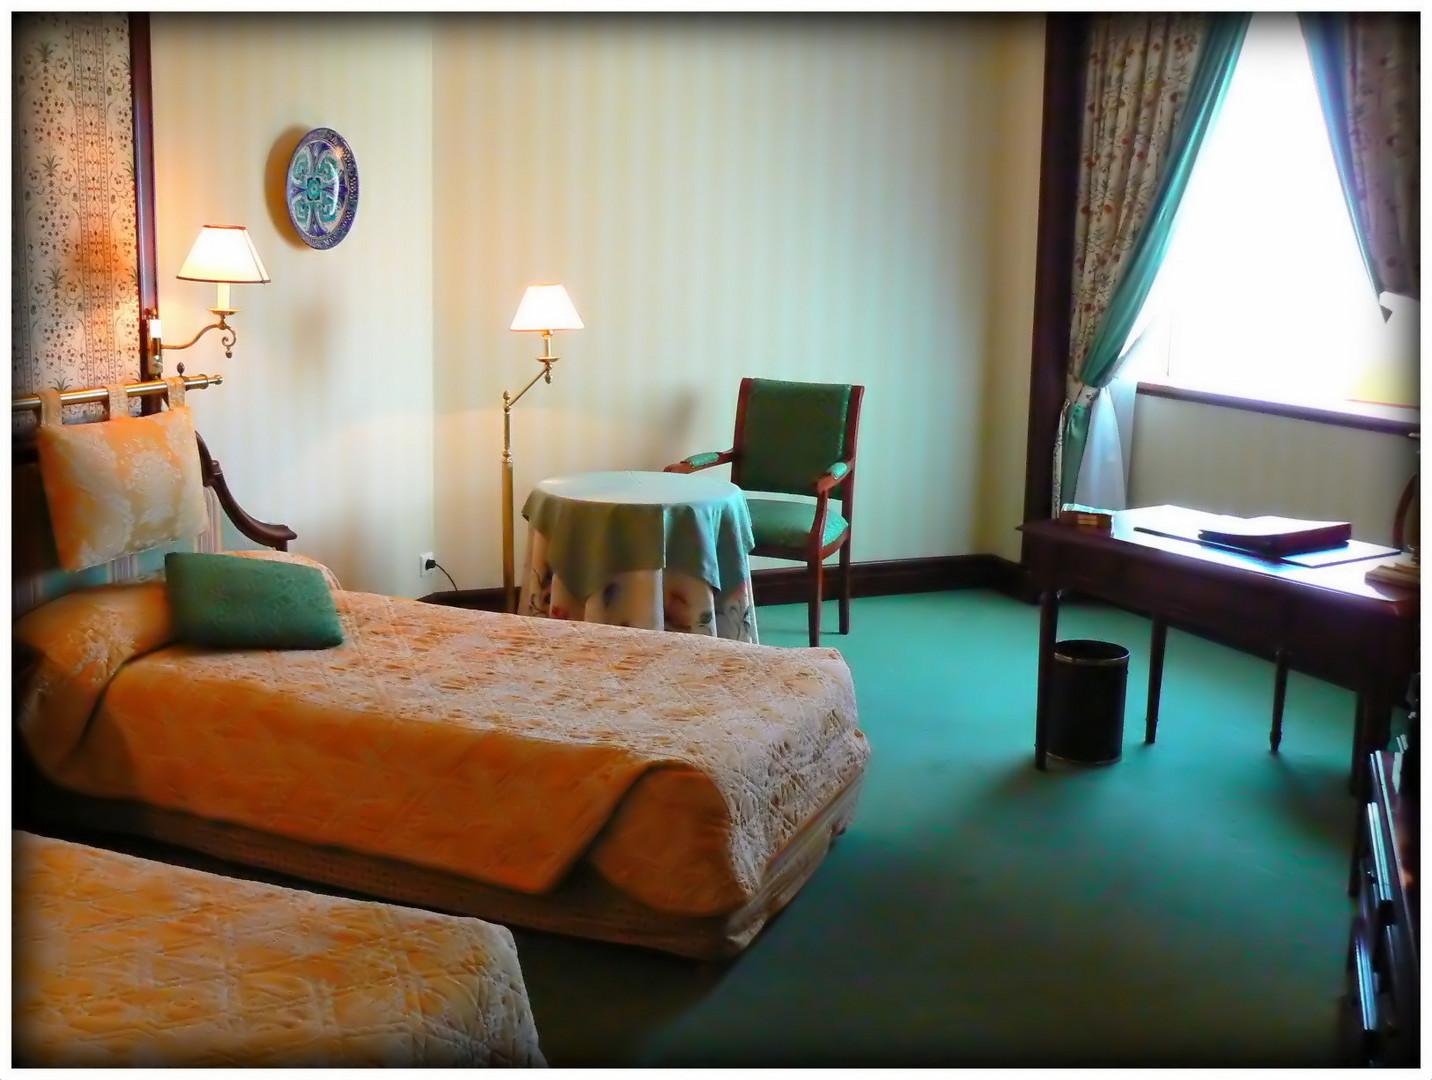 CHAMBRE - d ' HOTEL - OUZBECK